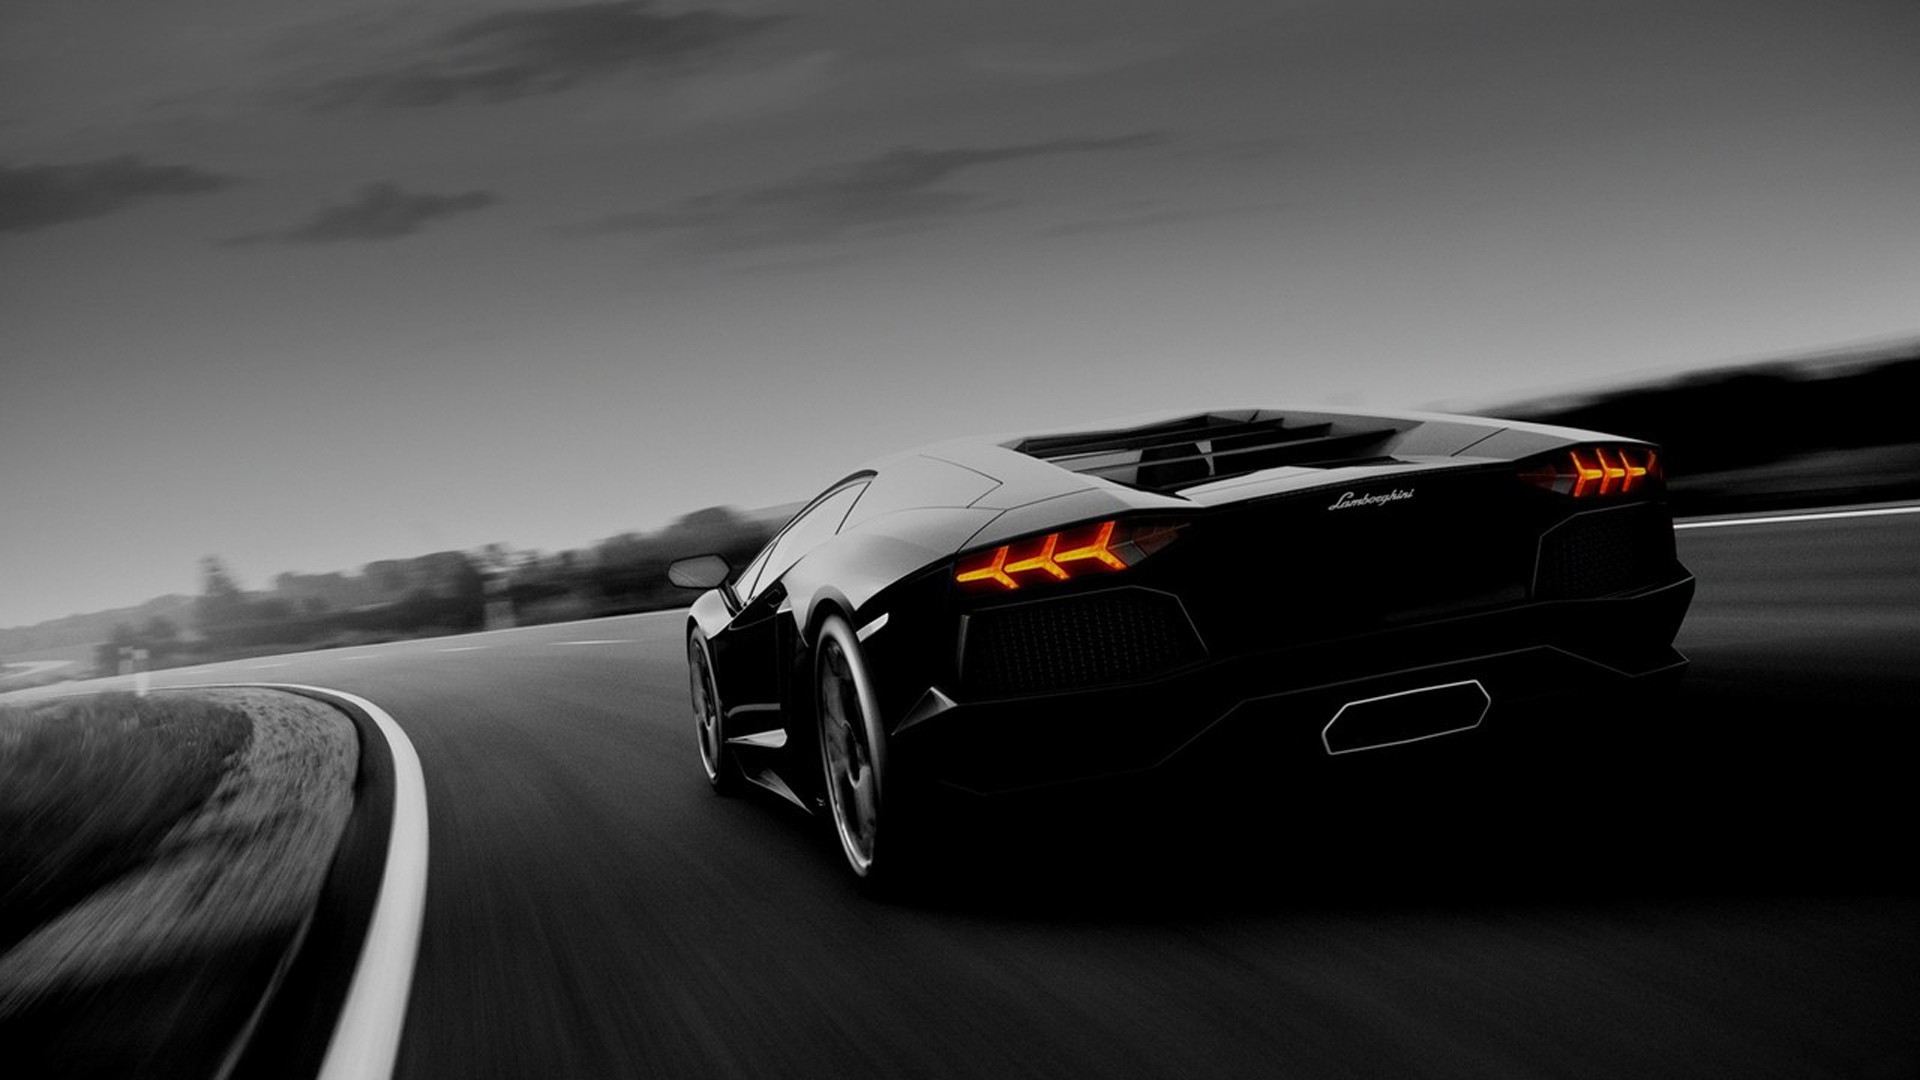 Lamborghini ламборгини тоннель  № 315921 загрузить